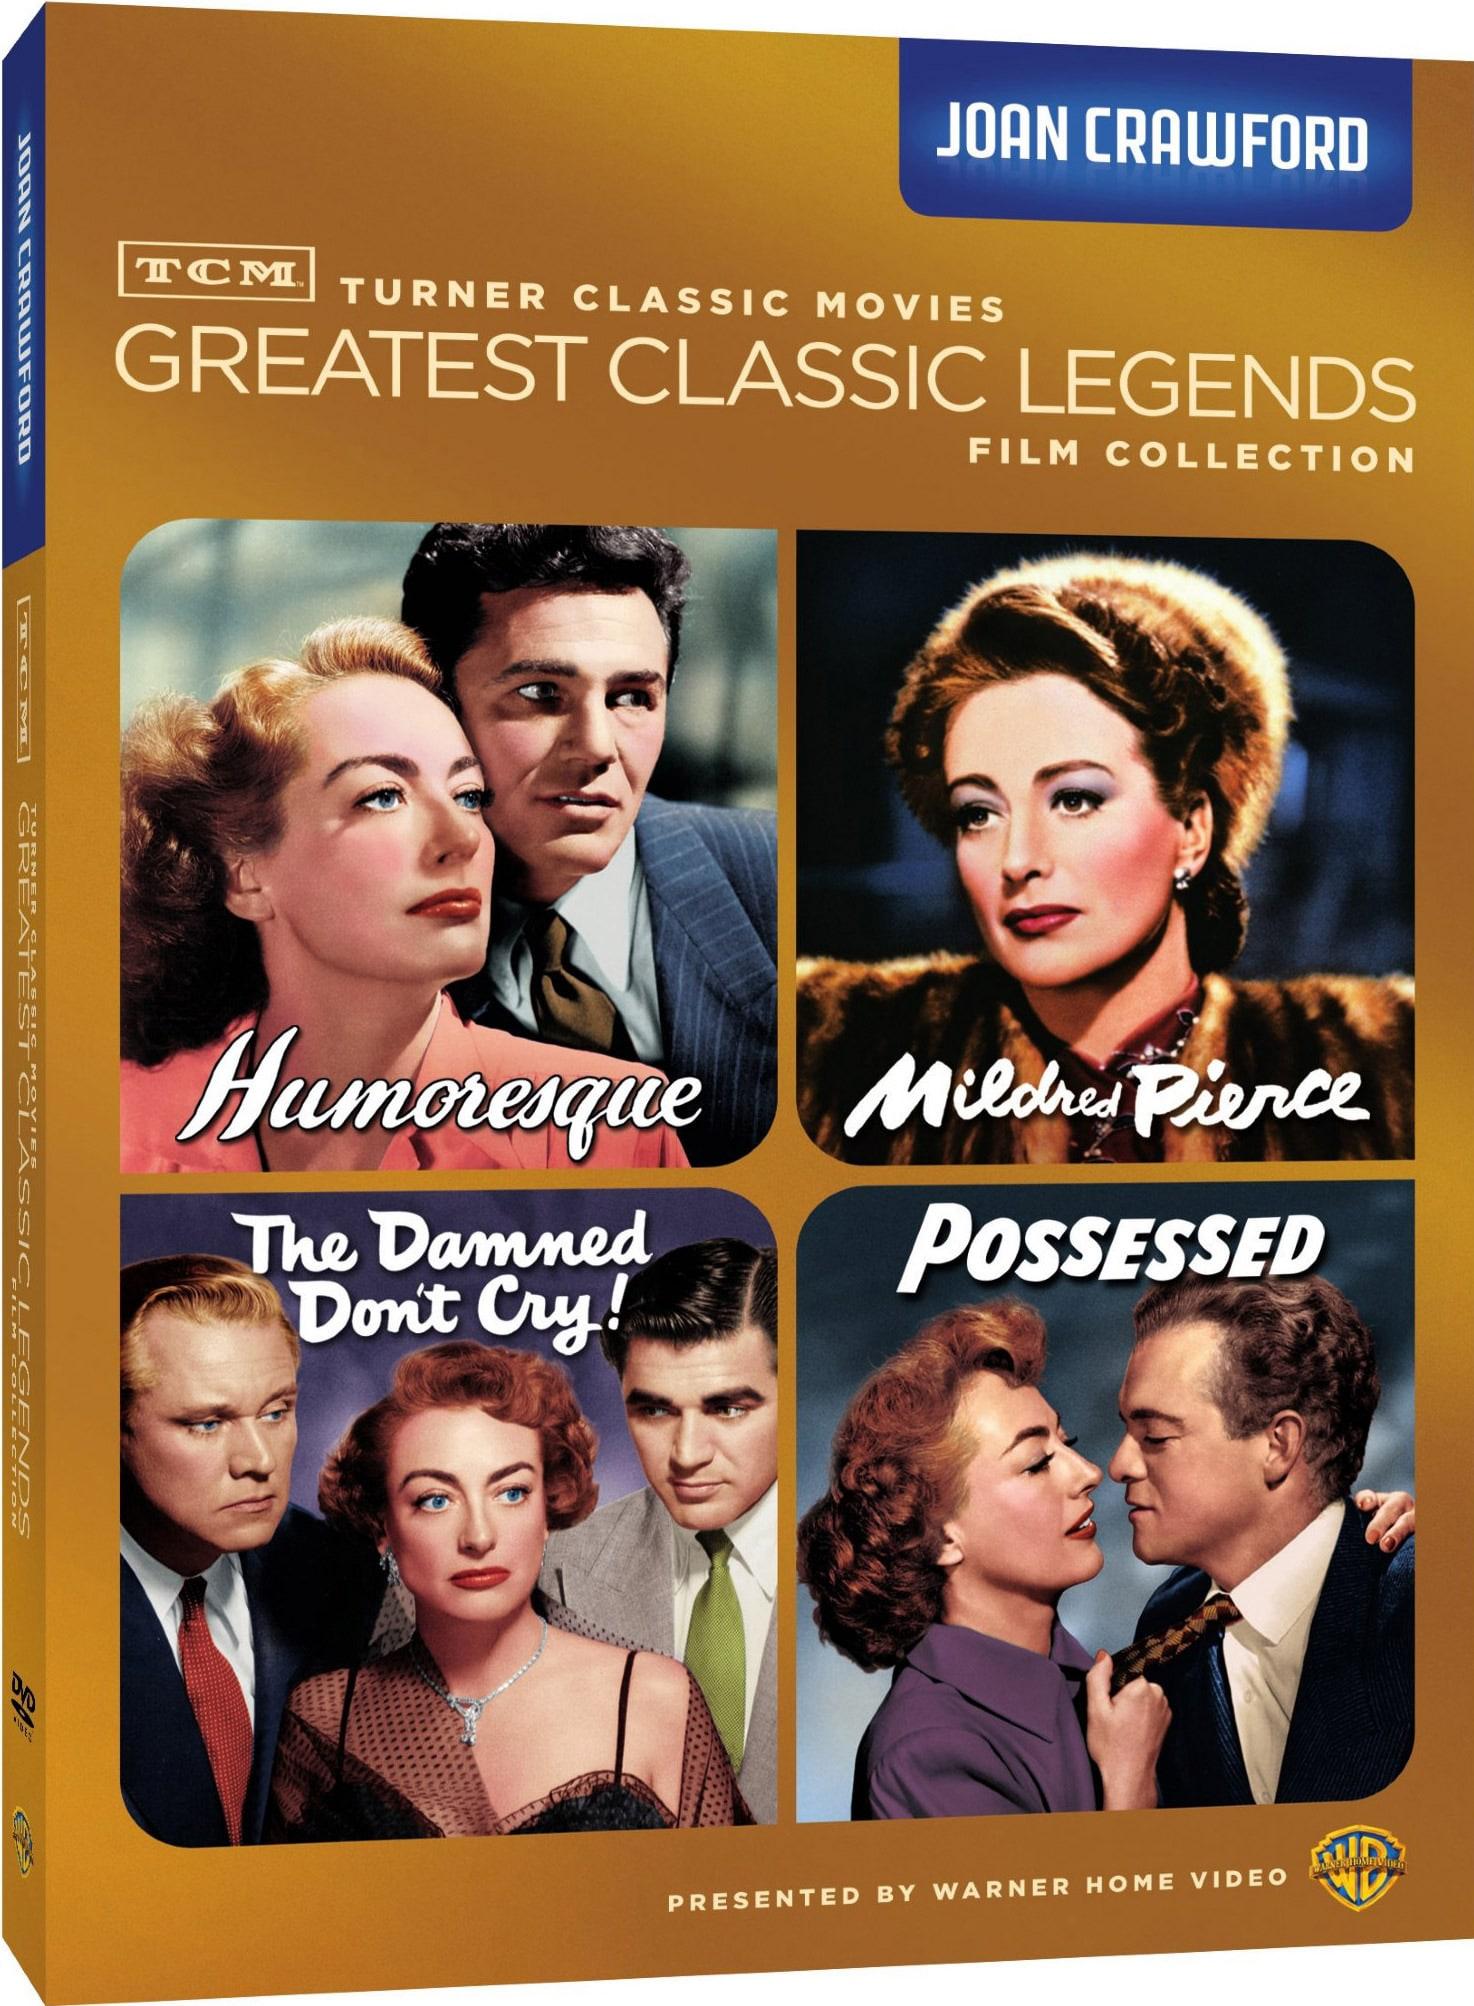 TCM Greatest Classic Films: Legends - Joan Crawford (DVD)